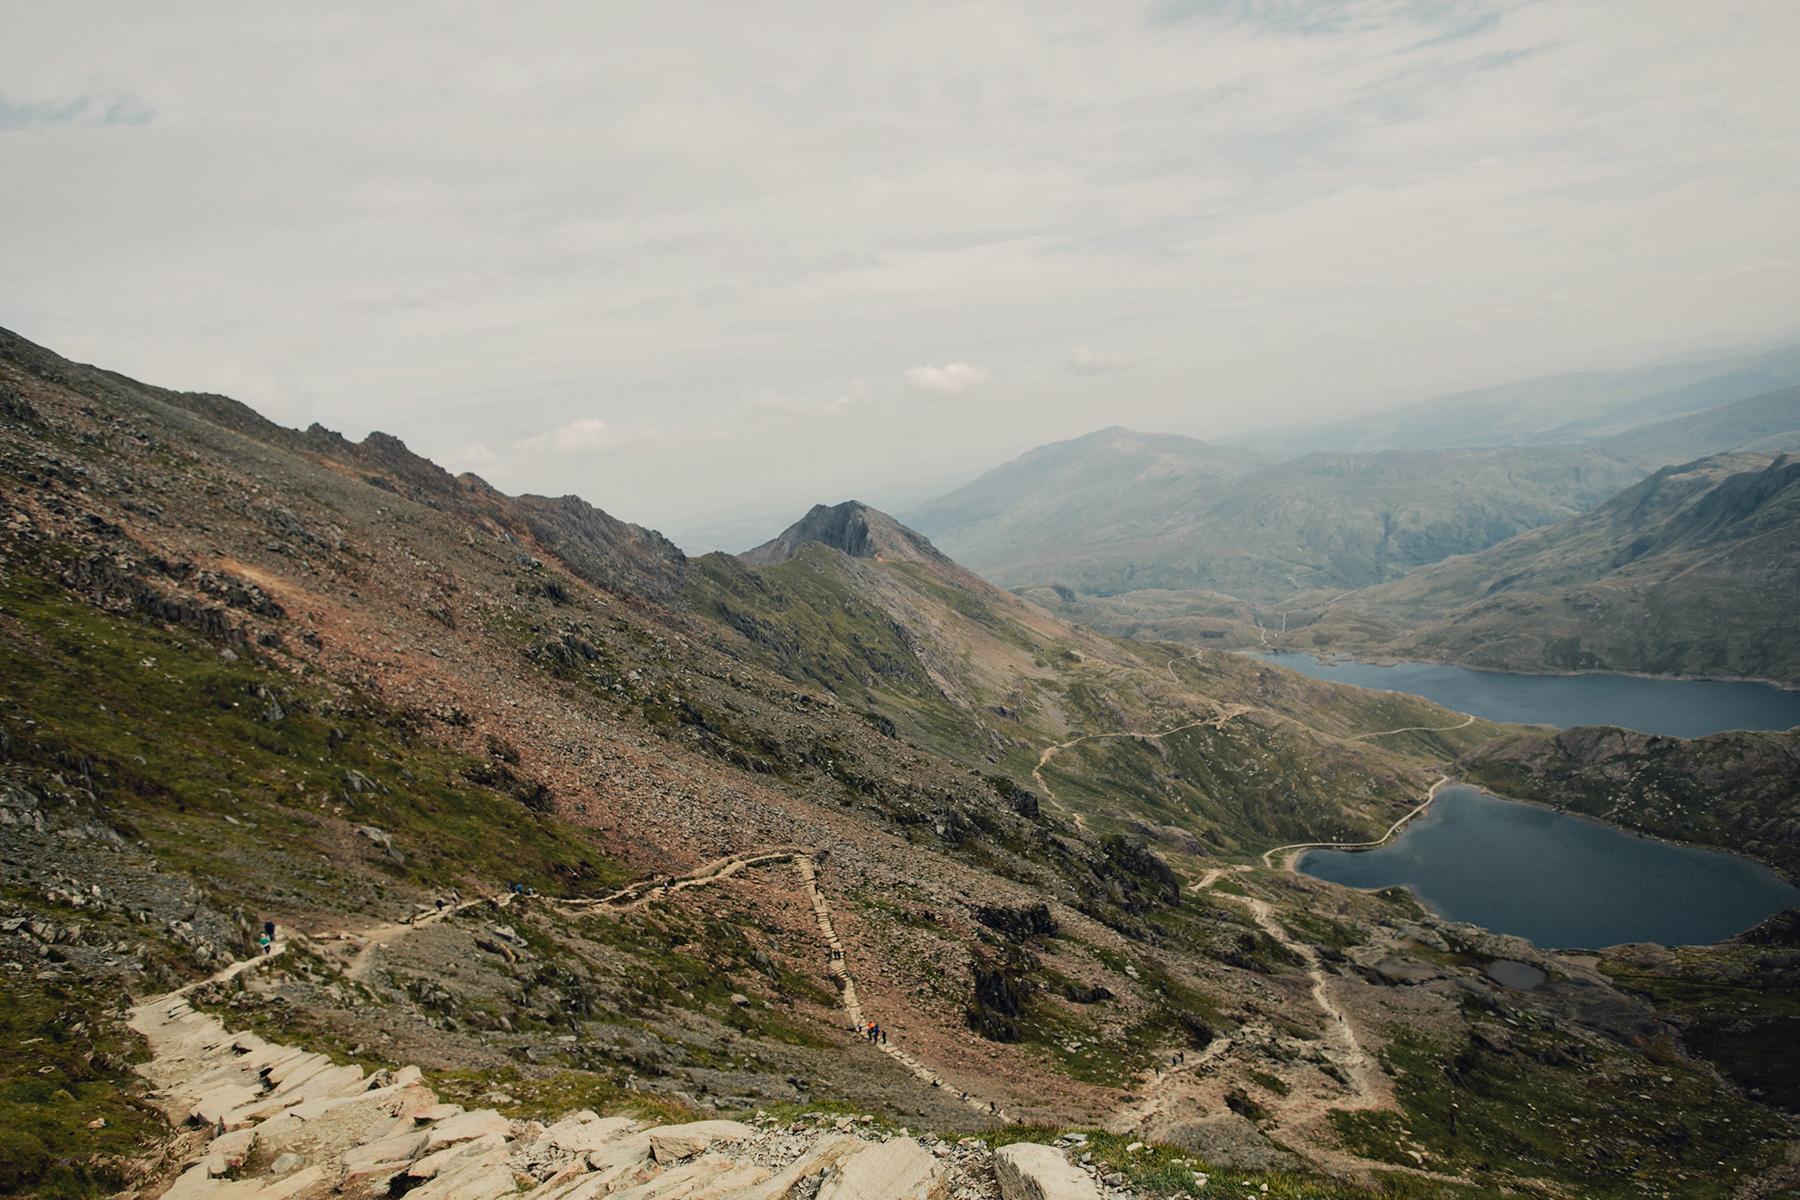 Mt-Snowdon-Hike-Photos-From-Peny-Pass-00161.jpg